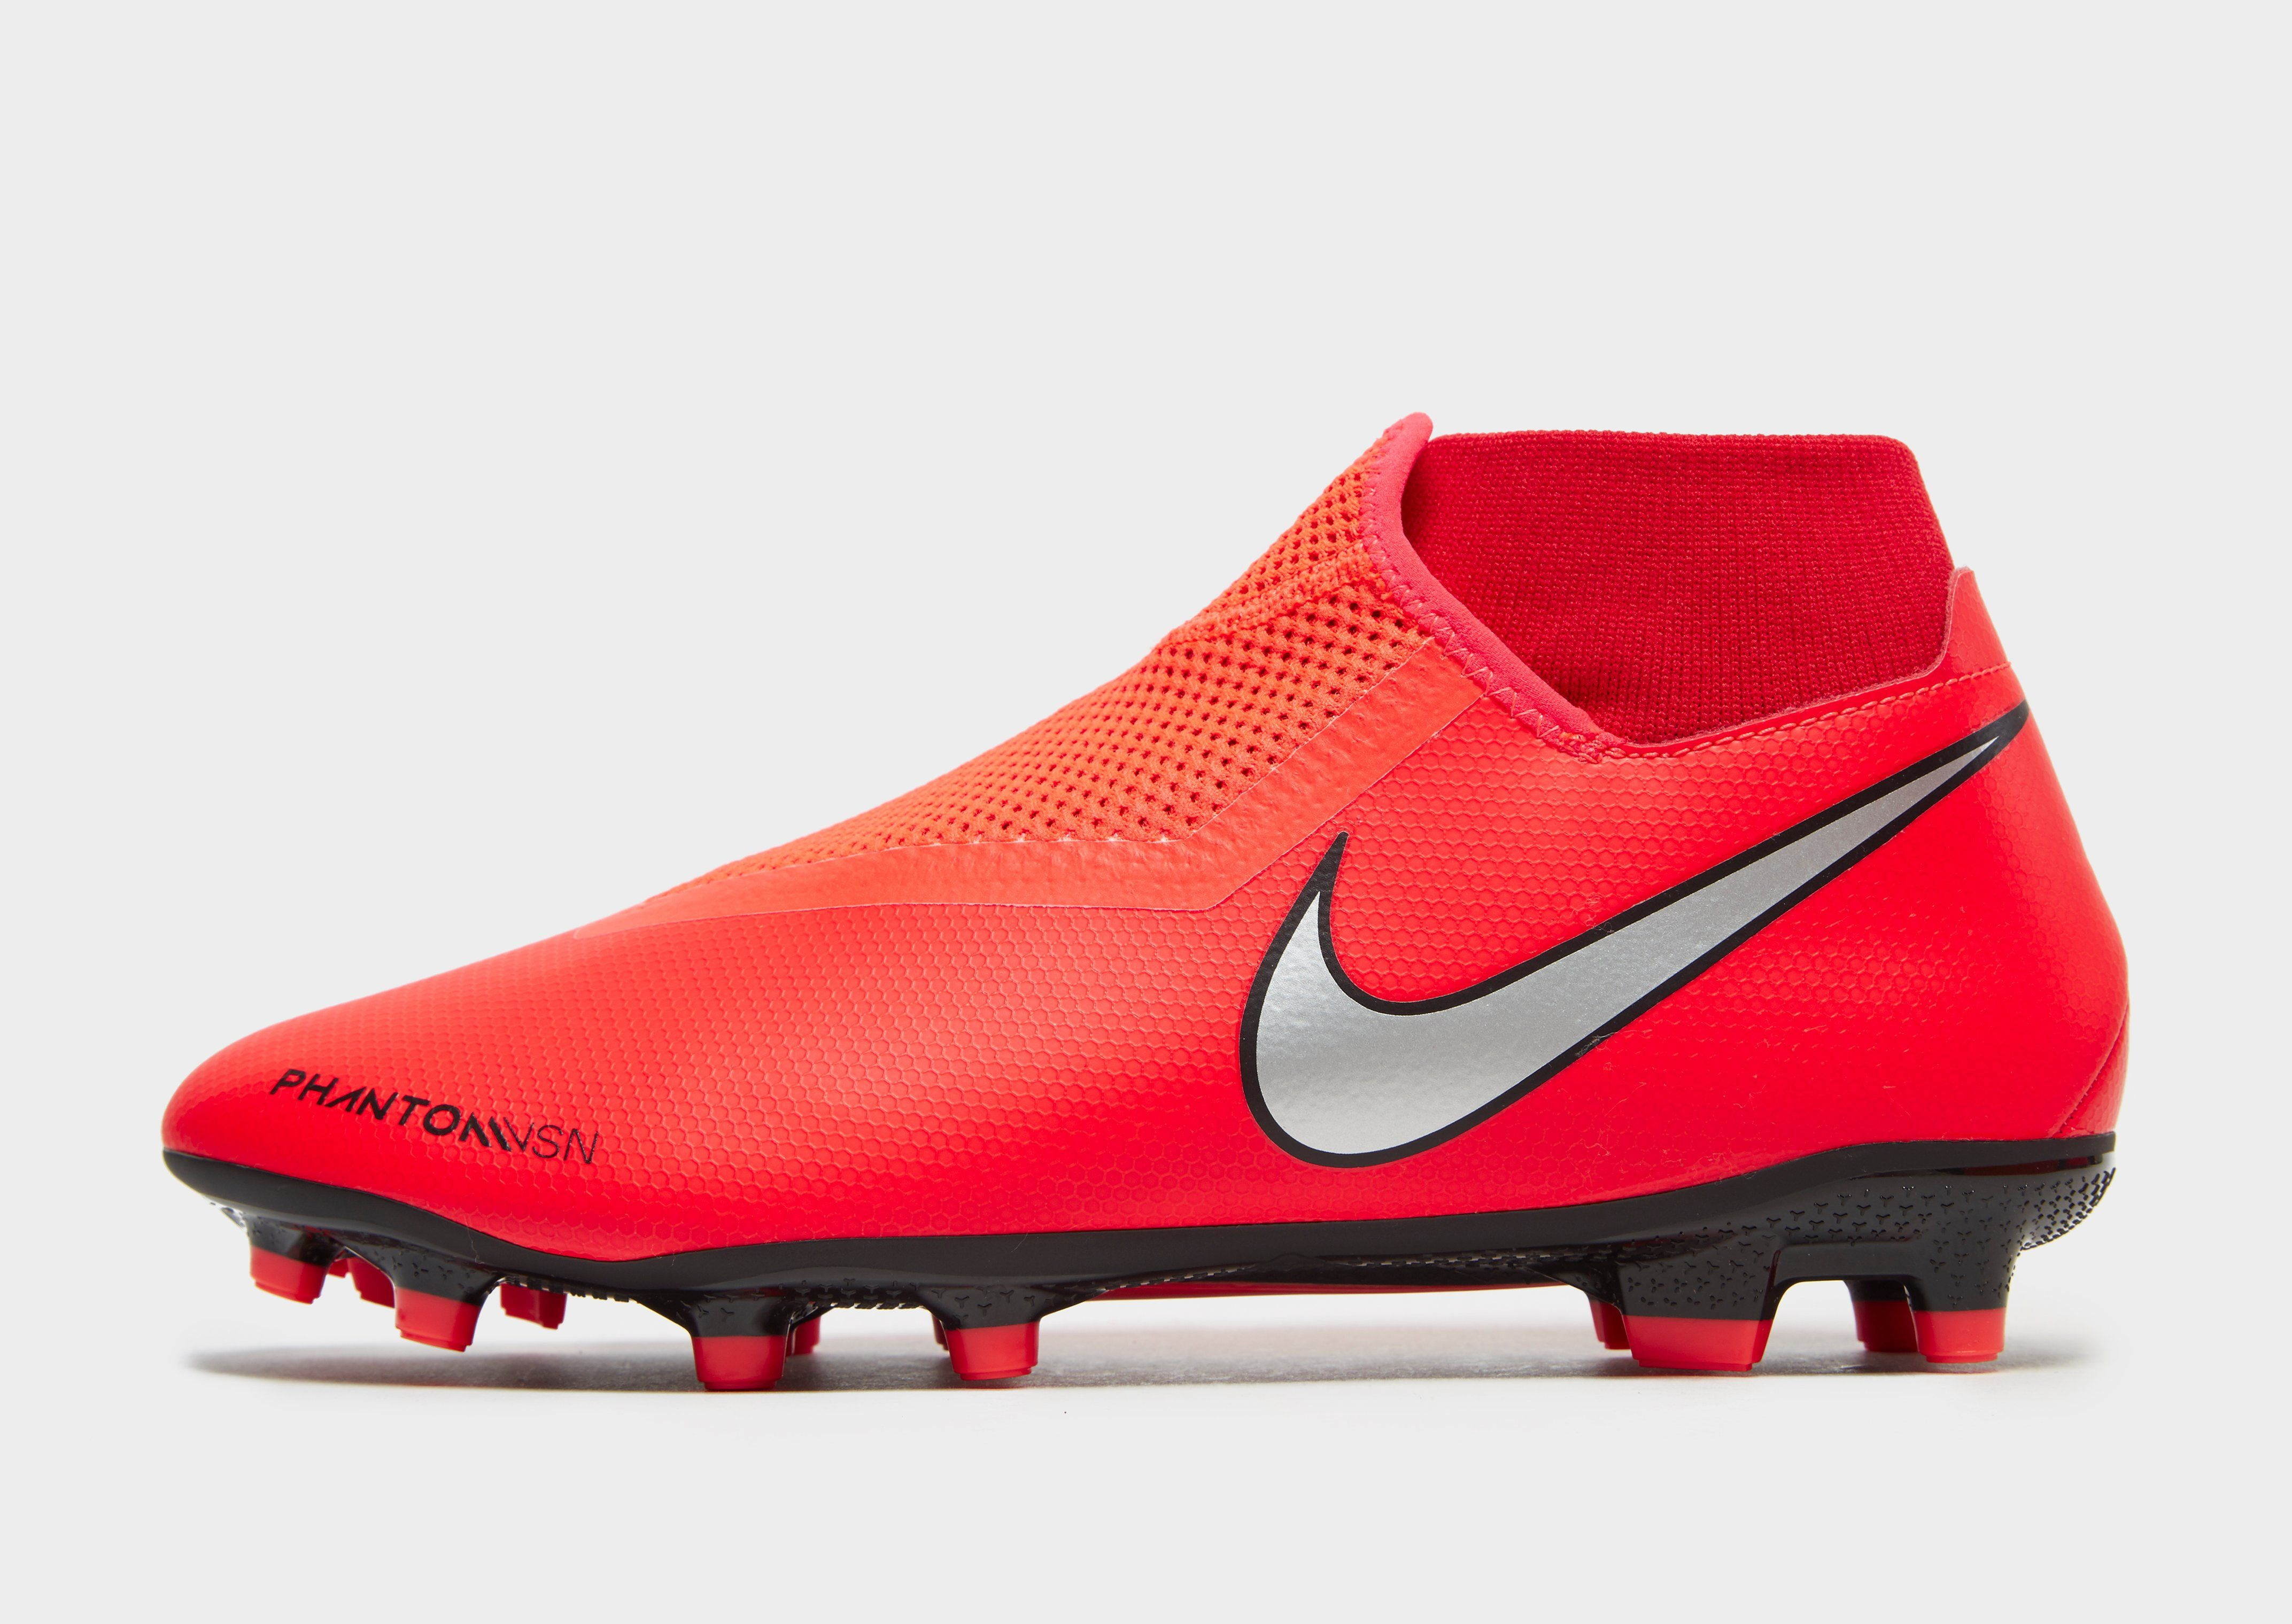 52a4fe422ac NIKE Nike Phantom Vision Academy Dynamic Fit MG Multi-Ground Football Boot